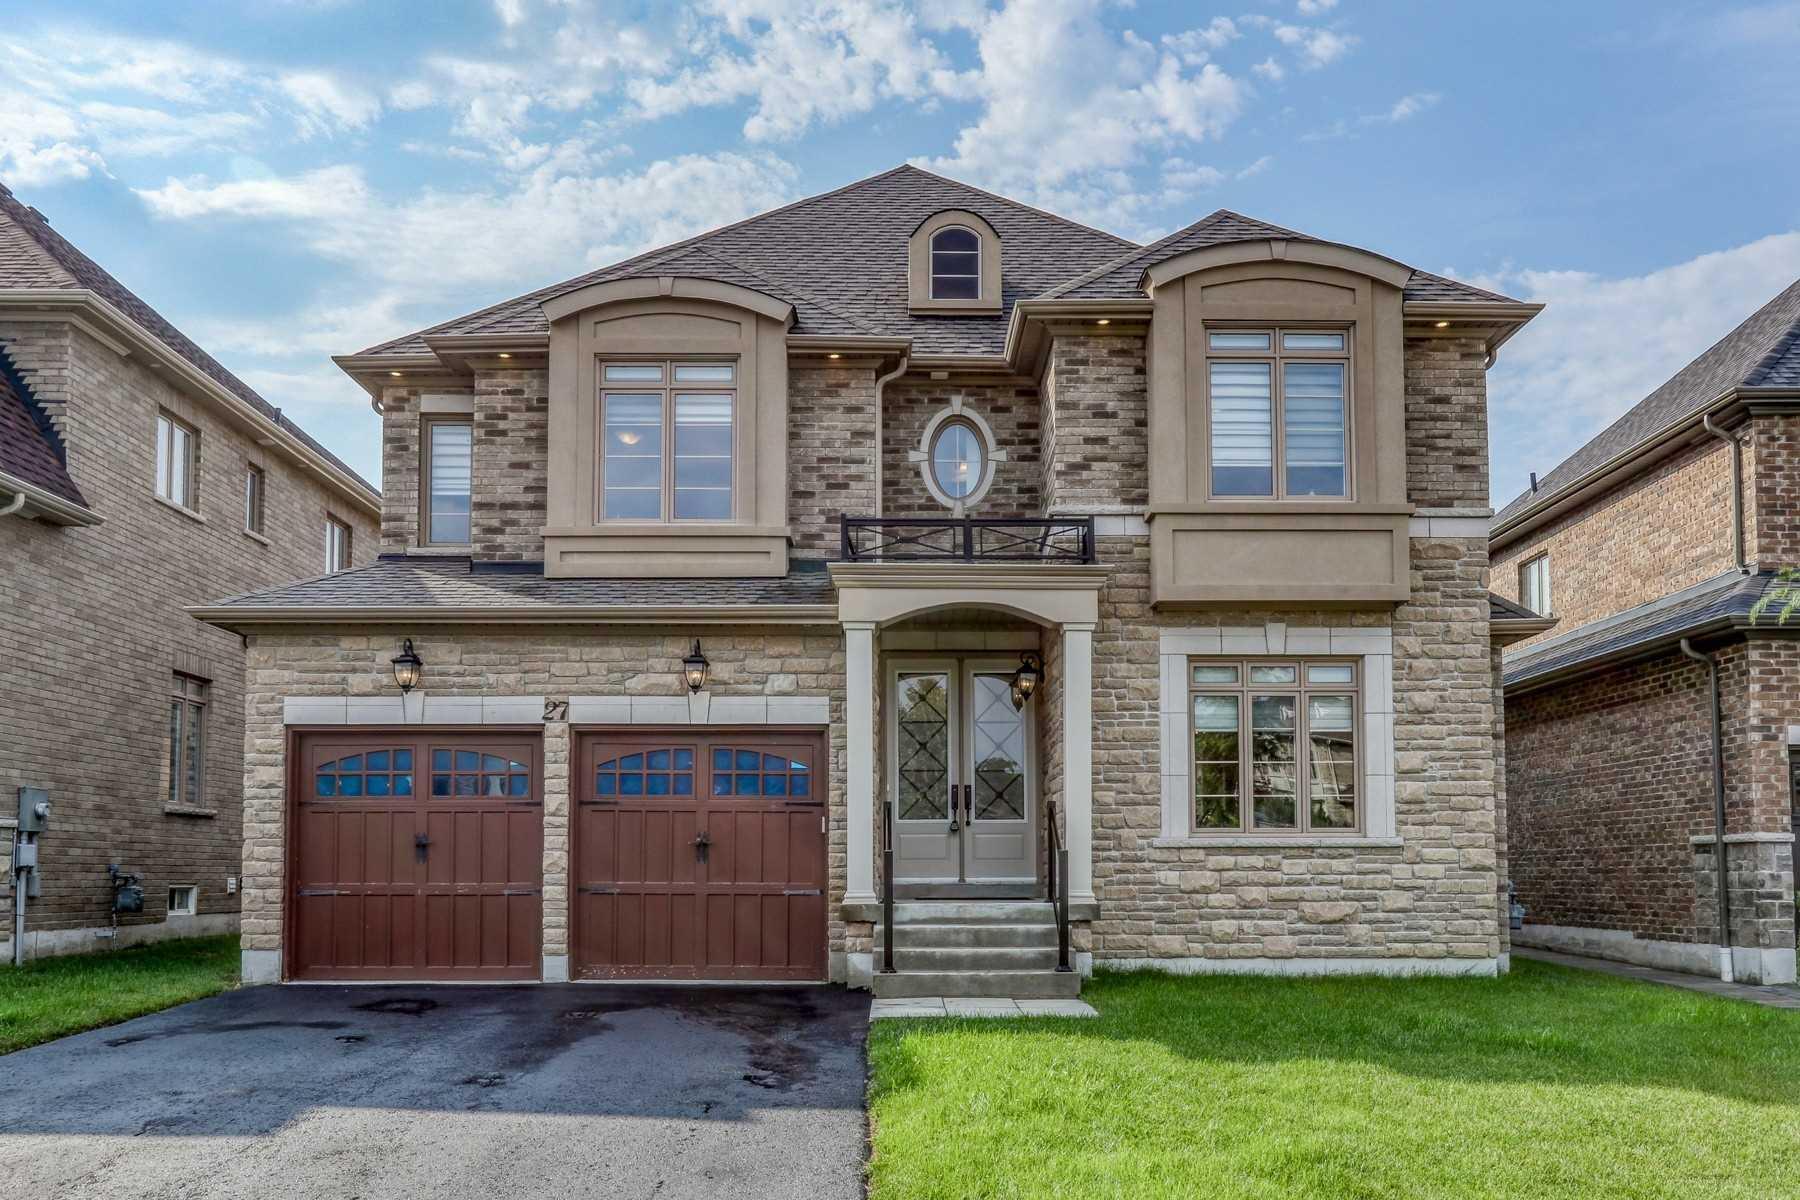 27 Glengowan St, Whitby Ontario, Canada